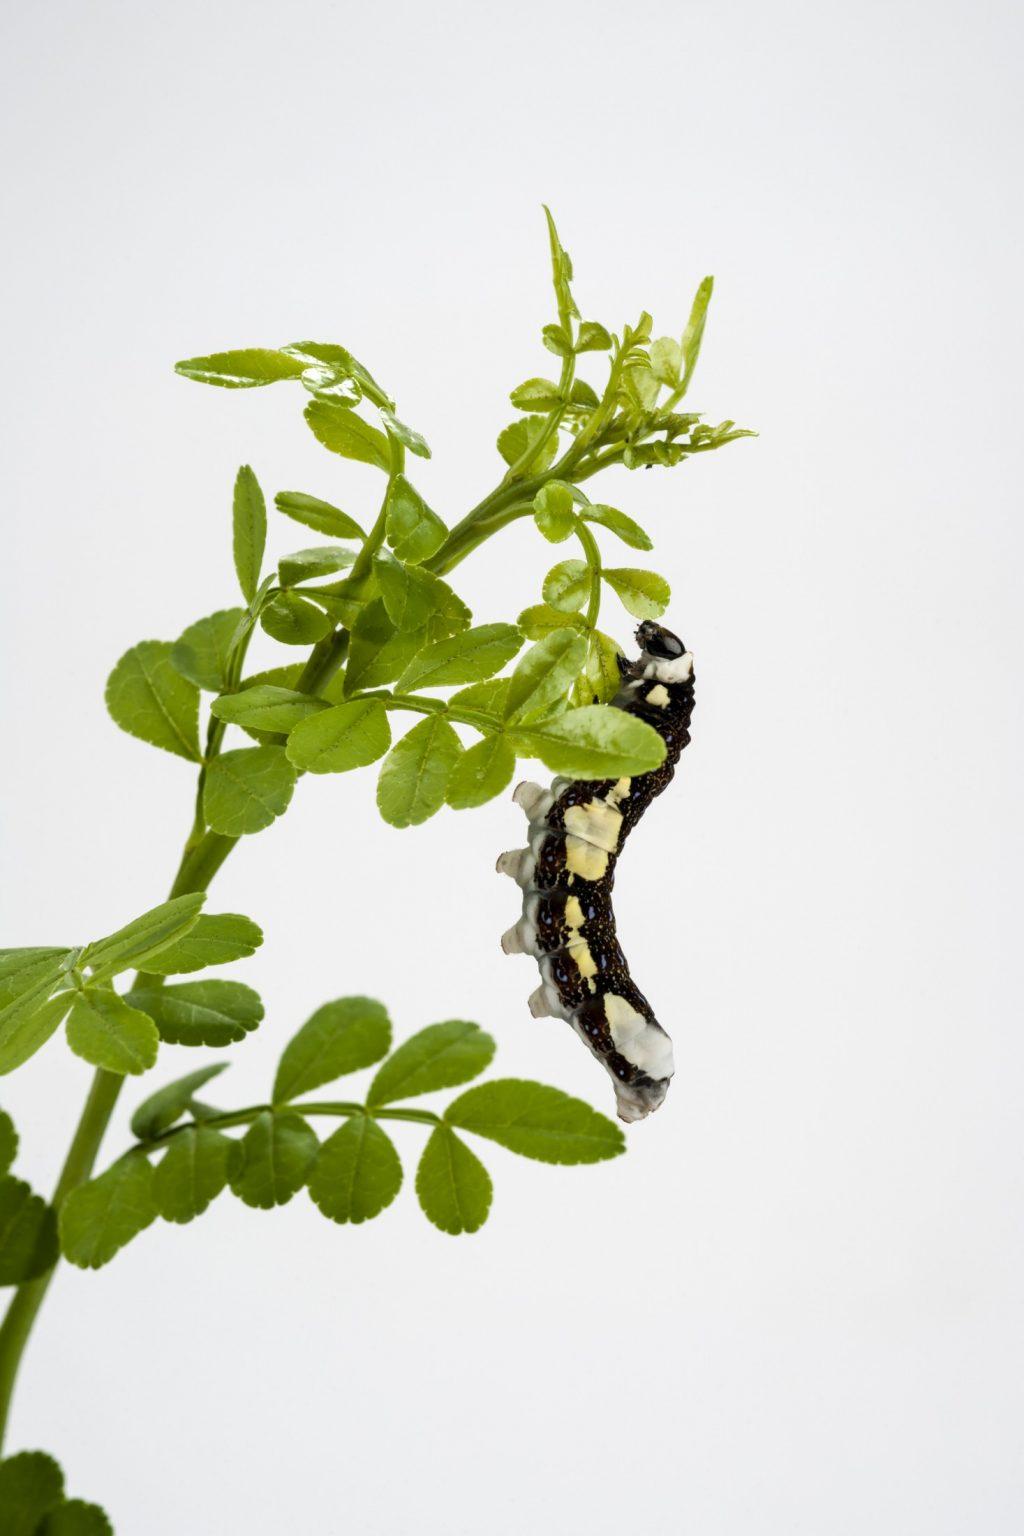 Schaus' swallowtail caterpillar munching on fresh wild lime leaves